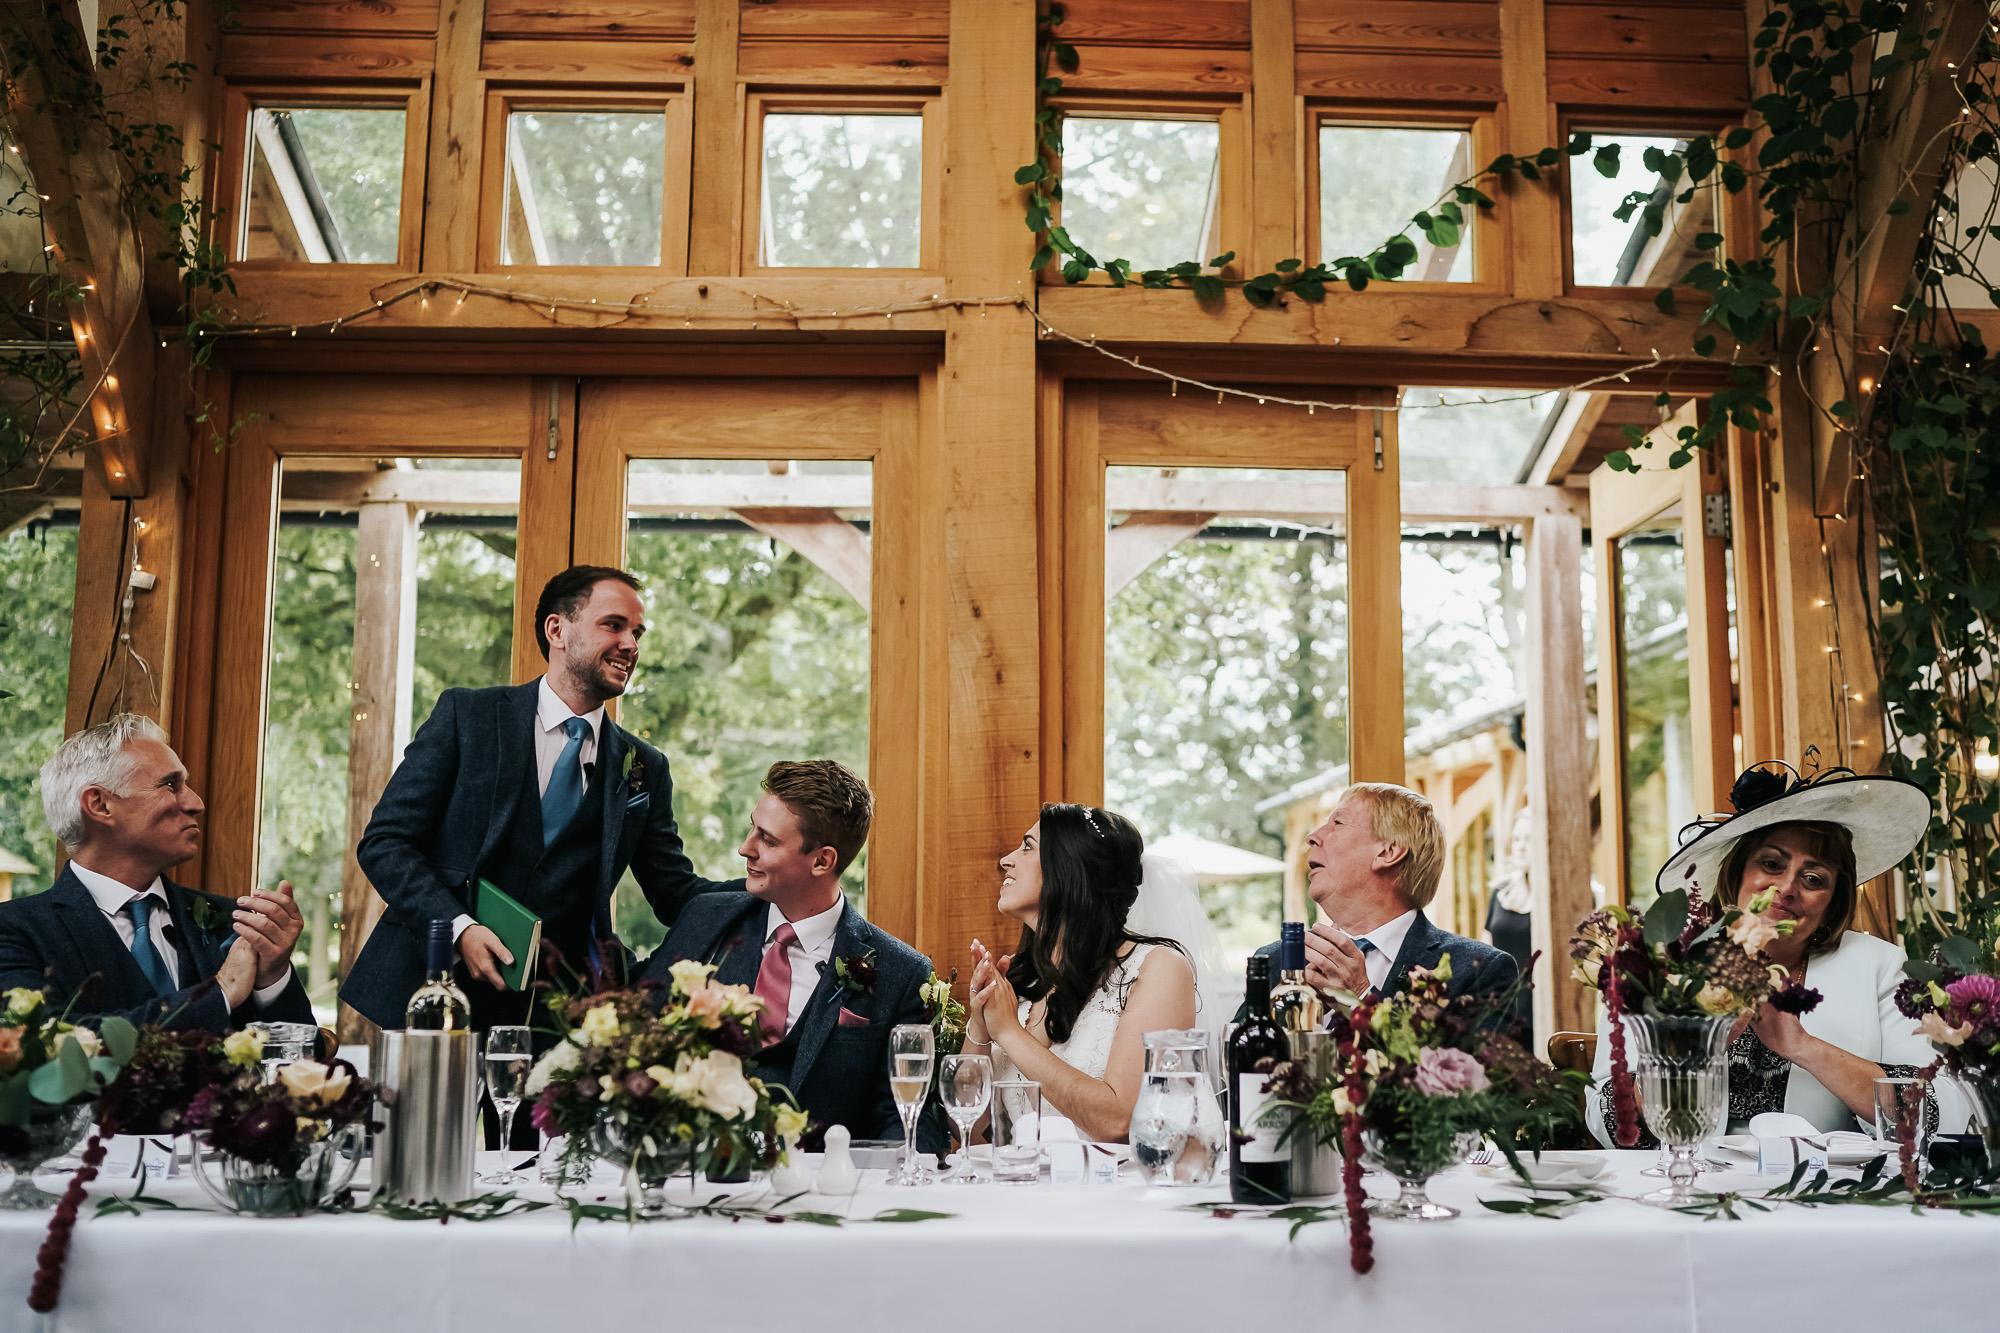 Oak tree of peover wedding photography cheshire wedding photographer (50 of 56).jpg